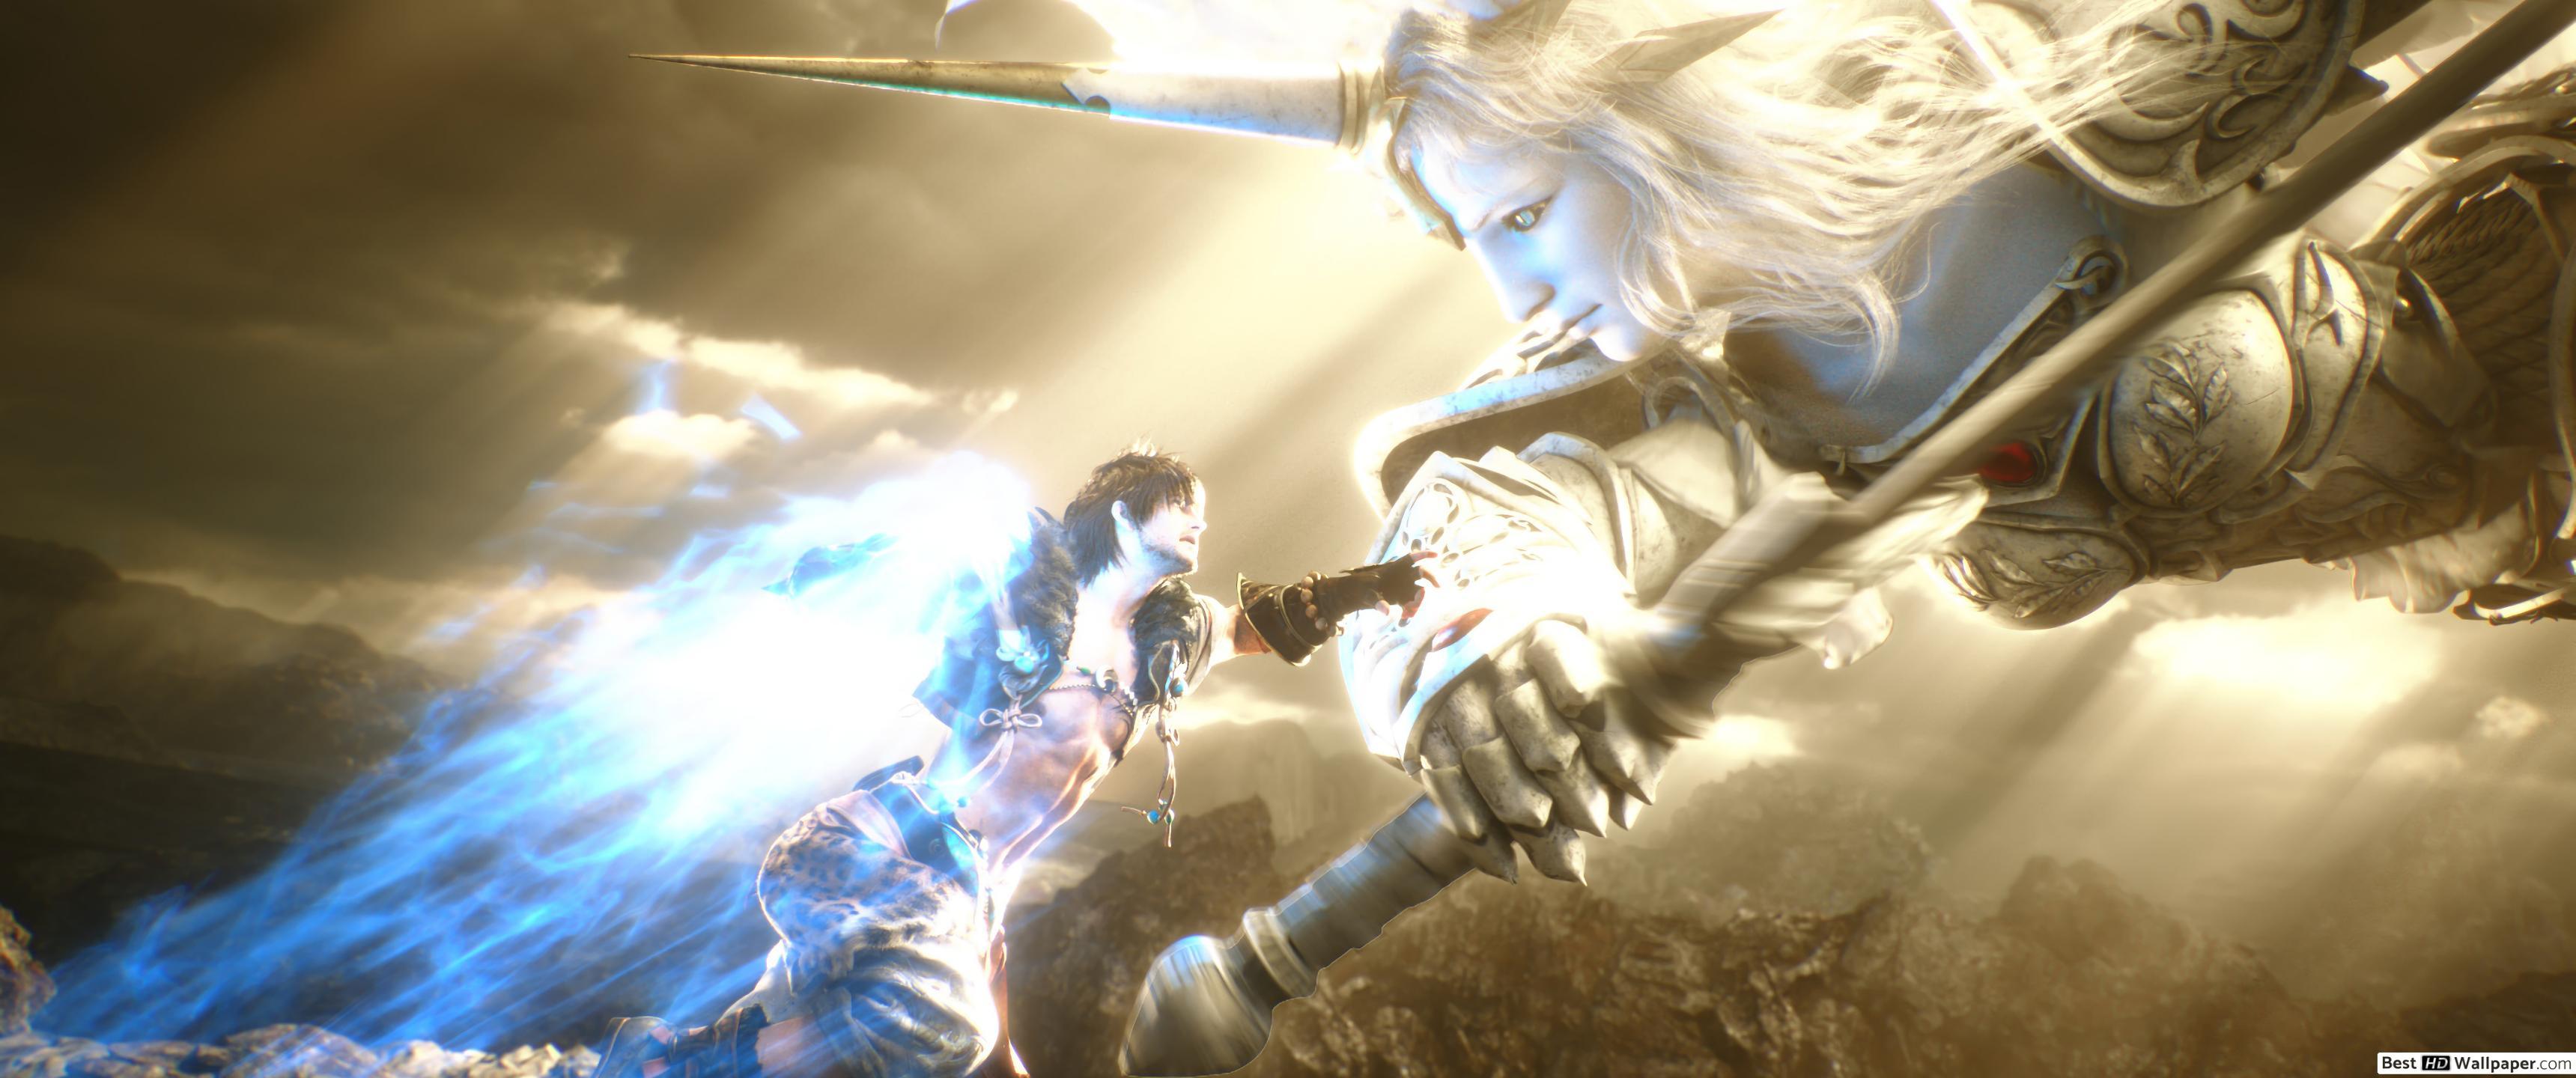 Final Fantasy Xiv Shadowbringers 2624409 Hd Wallpaper